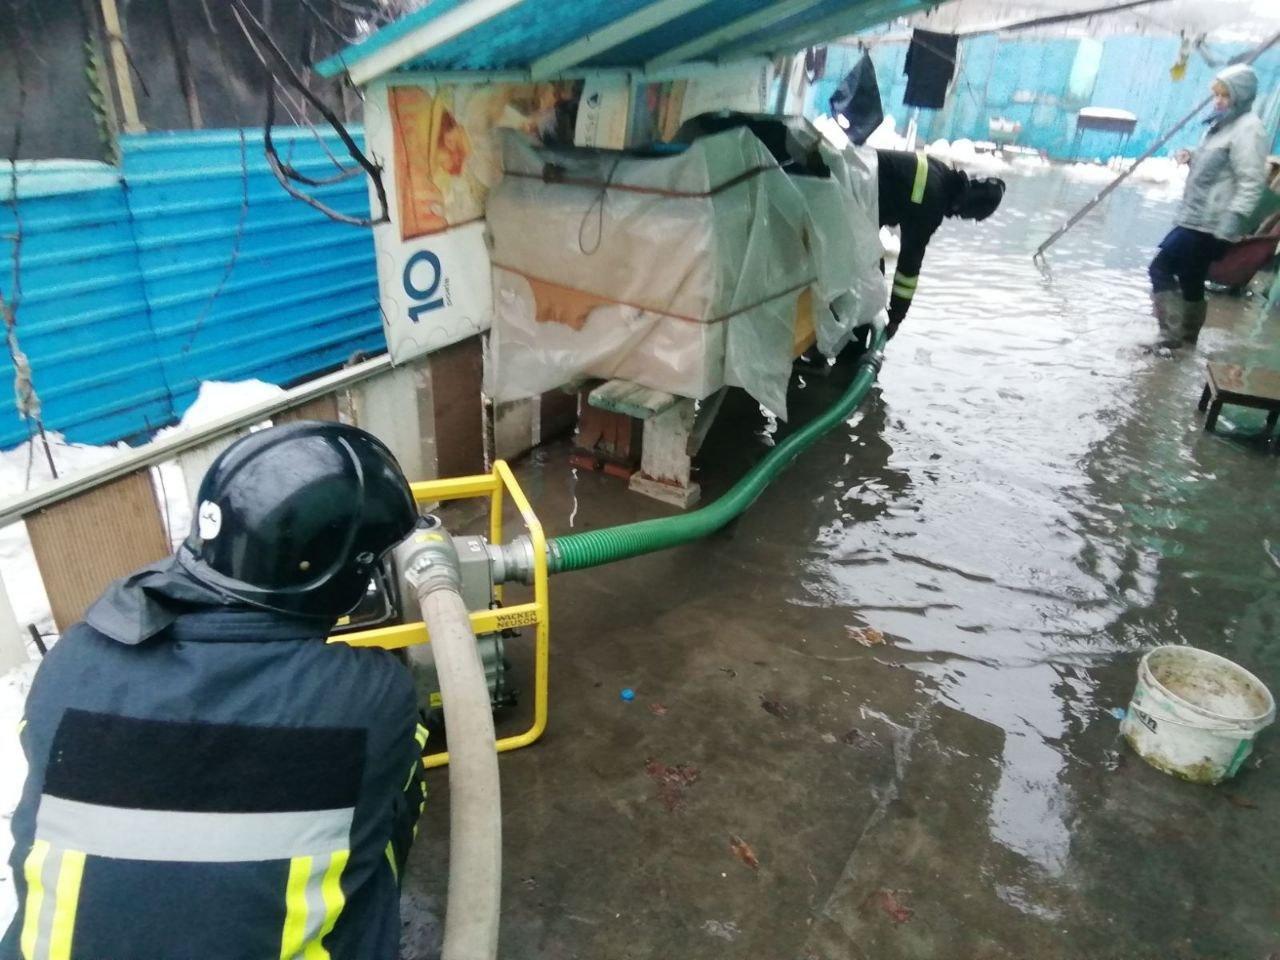 В Одессе дом из-за дождя и снега частично ушёл под воду, - ФОТО, фото-2